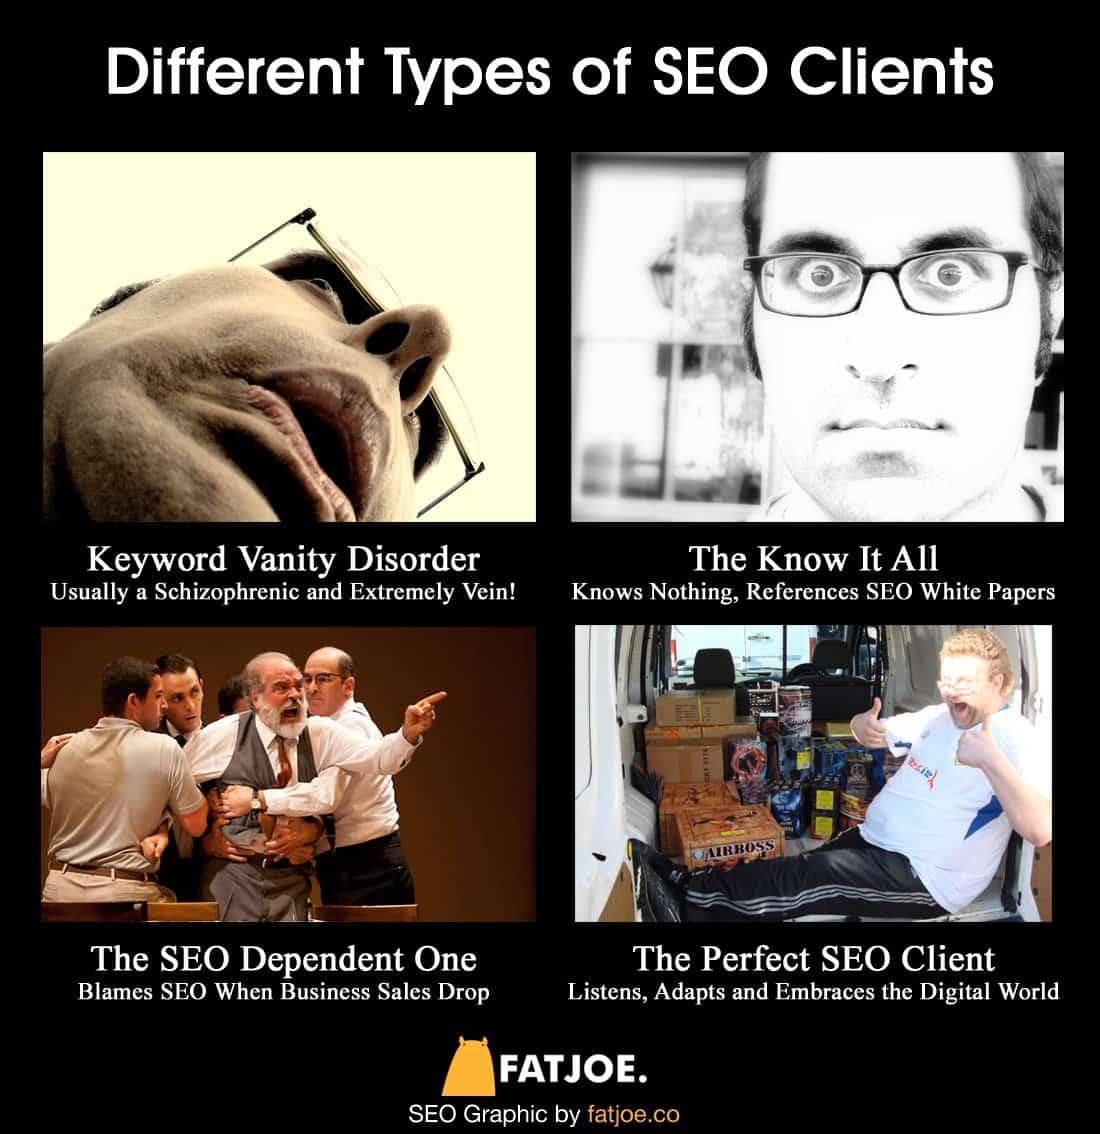 SEO Clients